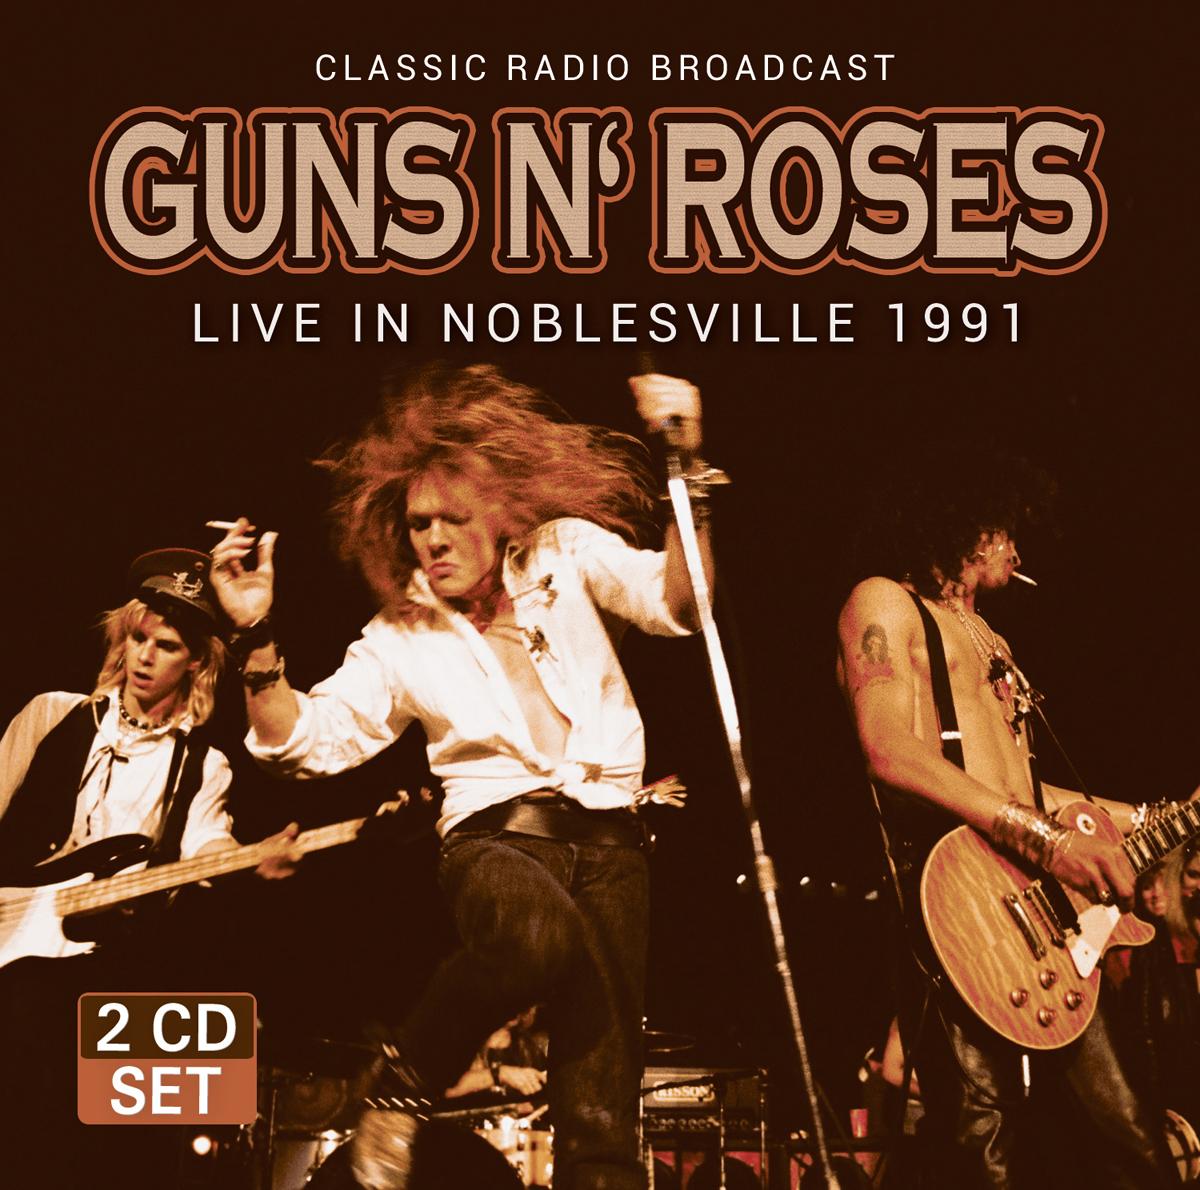 Guns 'N Roses Guns 'N Roses. Live In Noblesville 1991 (2 CD) недорого